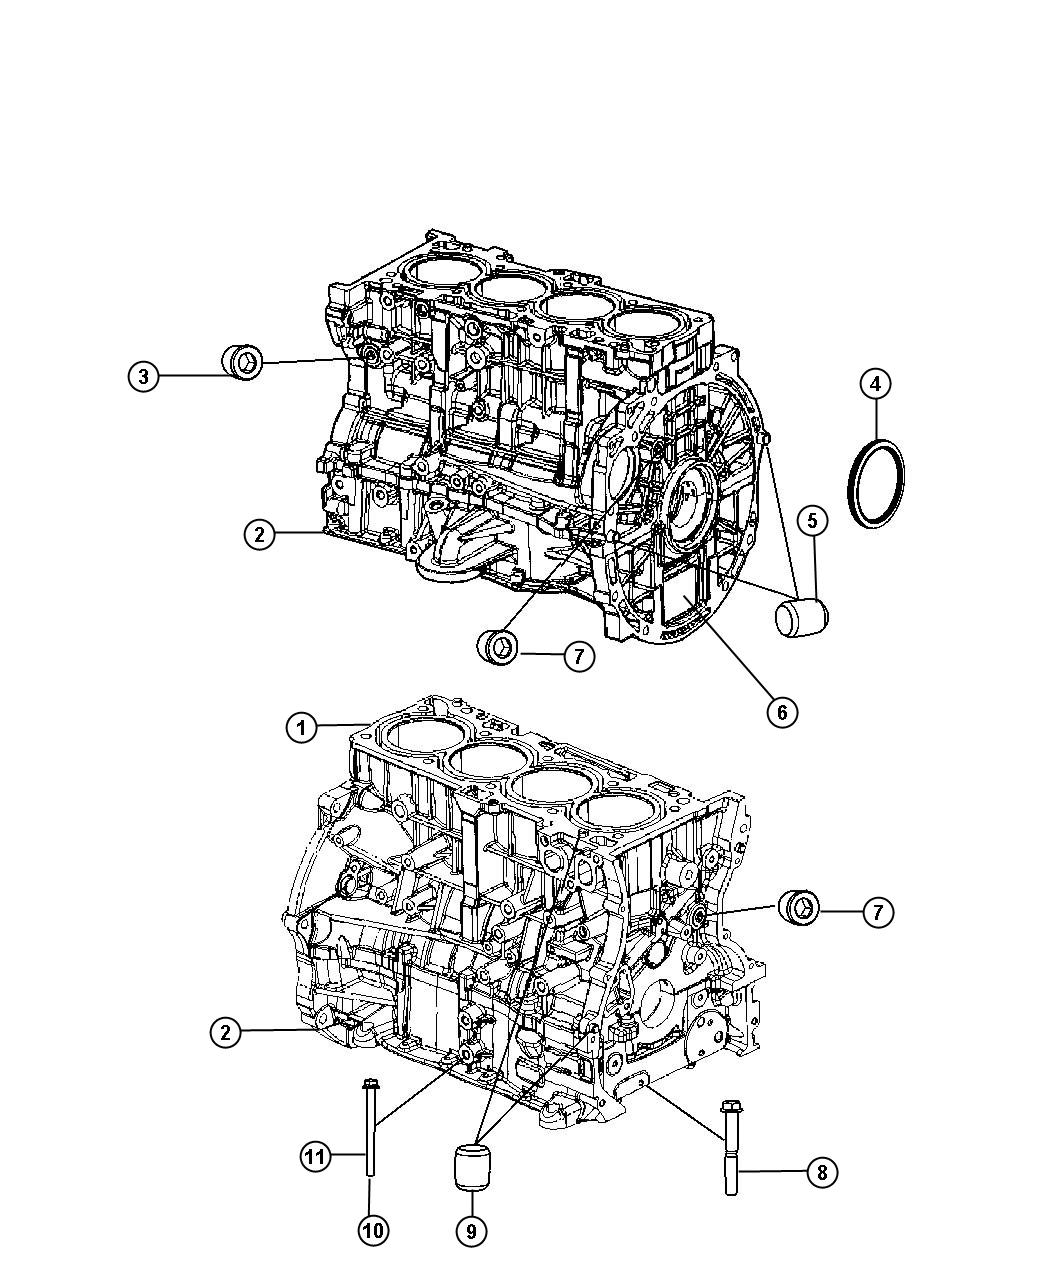 Dodge Journey Engine Parts Diagram Free Engine